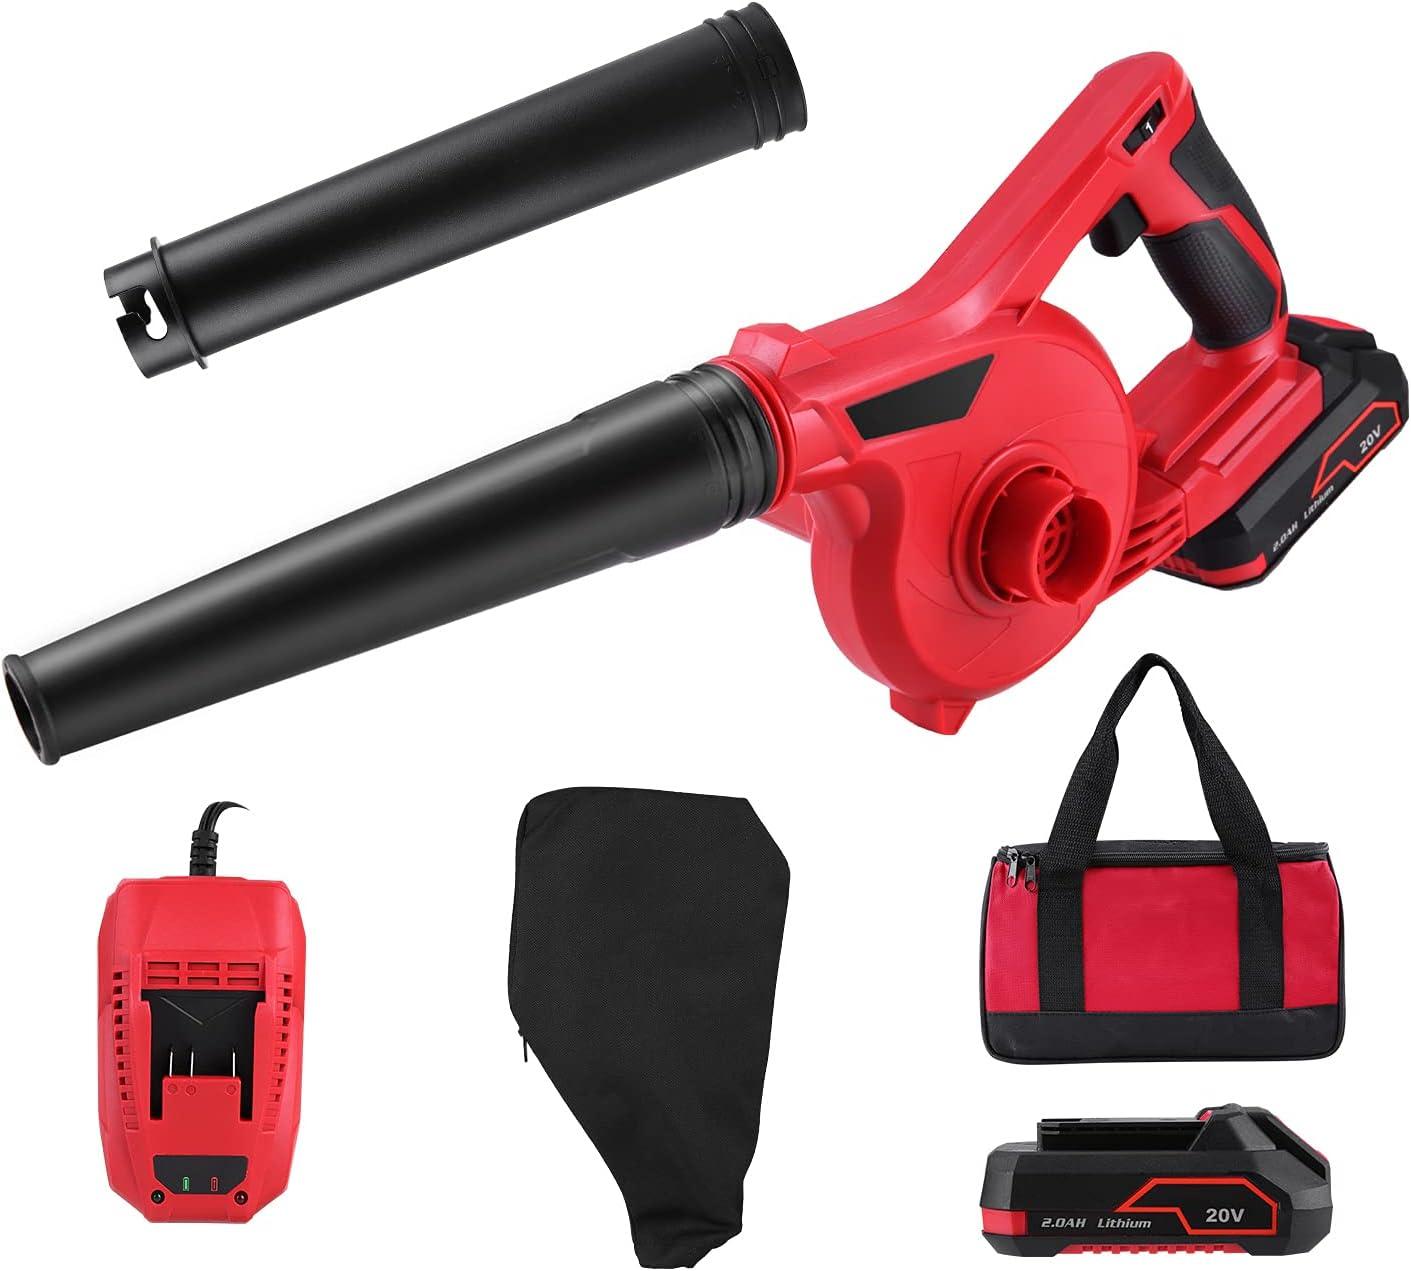 Leaf Blower 20 V sale Cordless Lightweight 3 with famous Variabl Kit